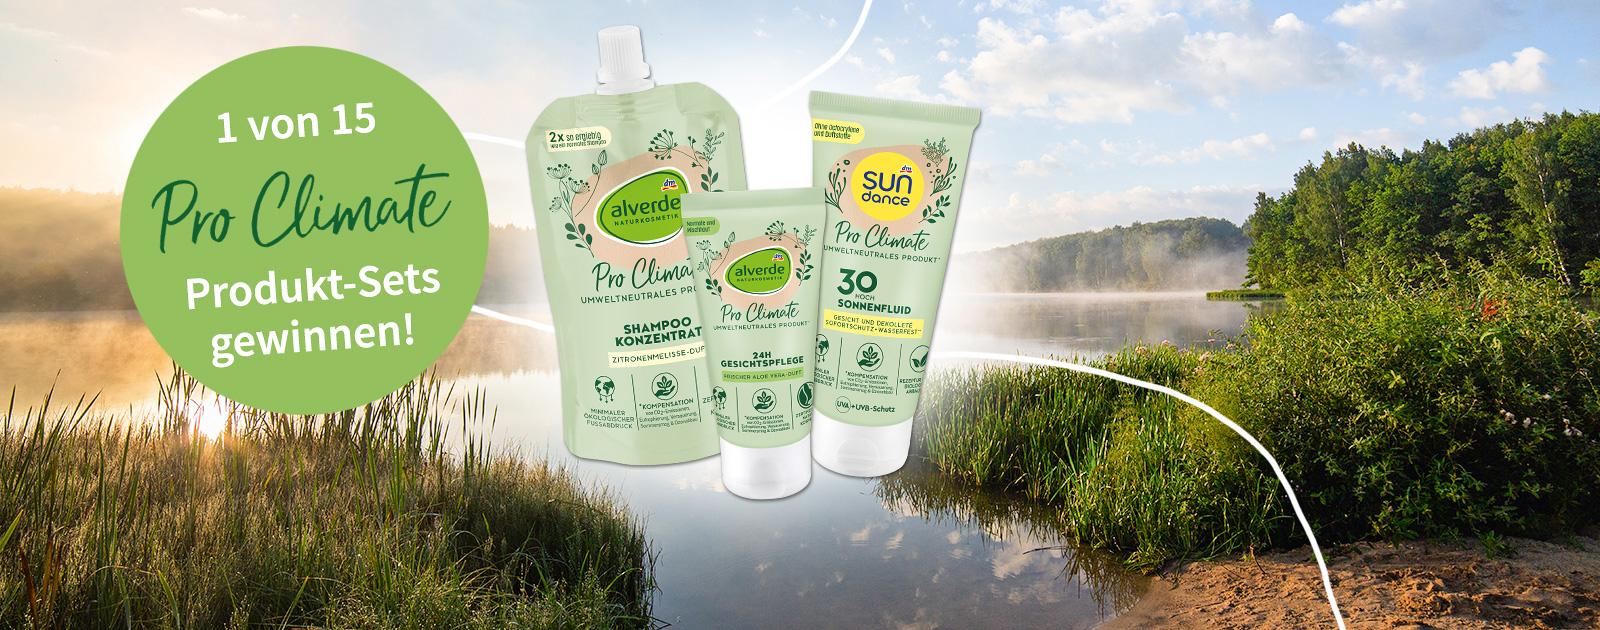 dm umweltneutrale Produkte gewinnen